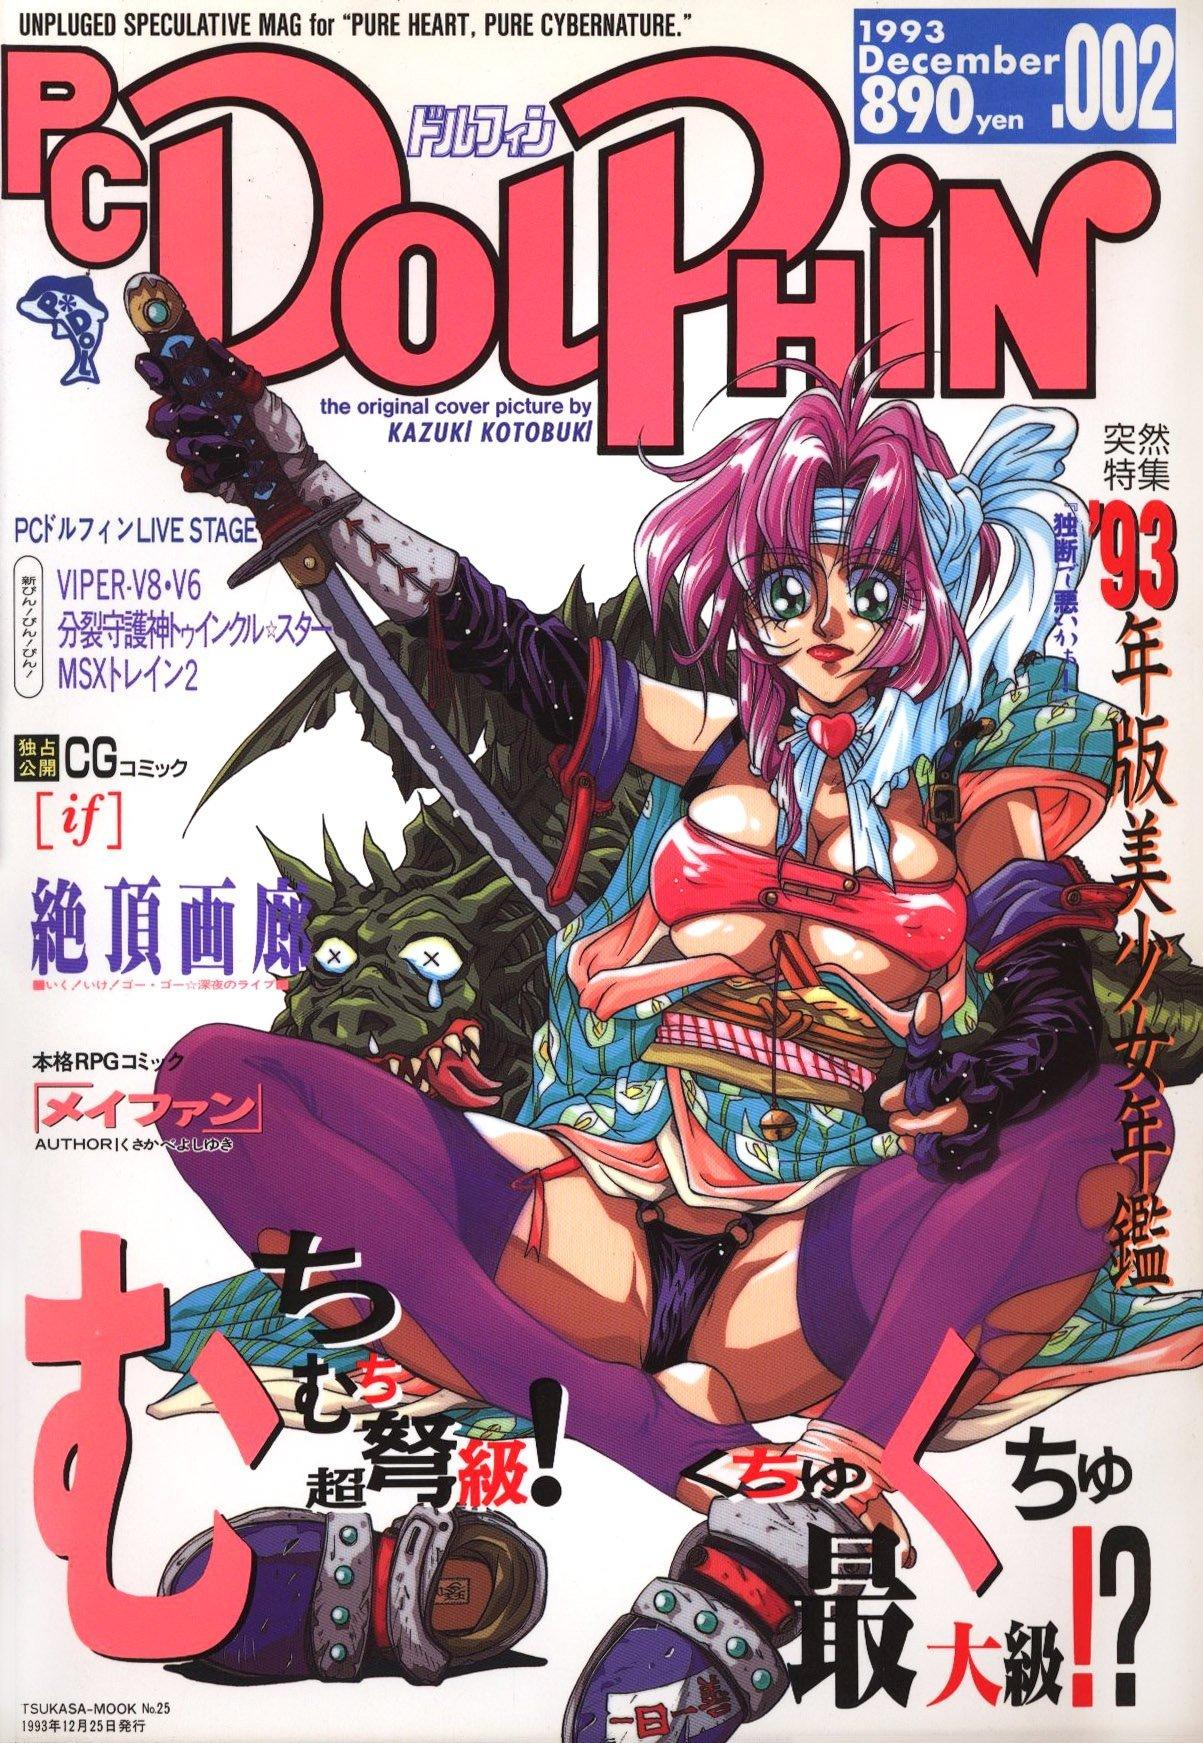 PC Dolphin Vol.02 (December 1993)